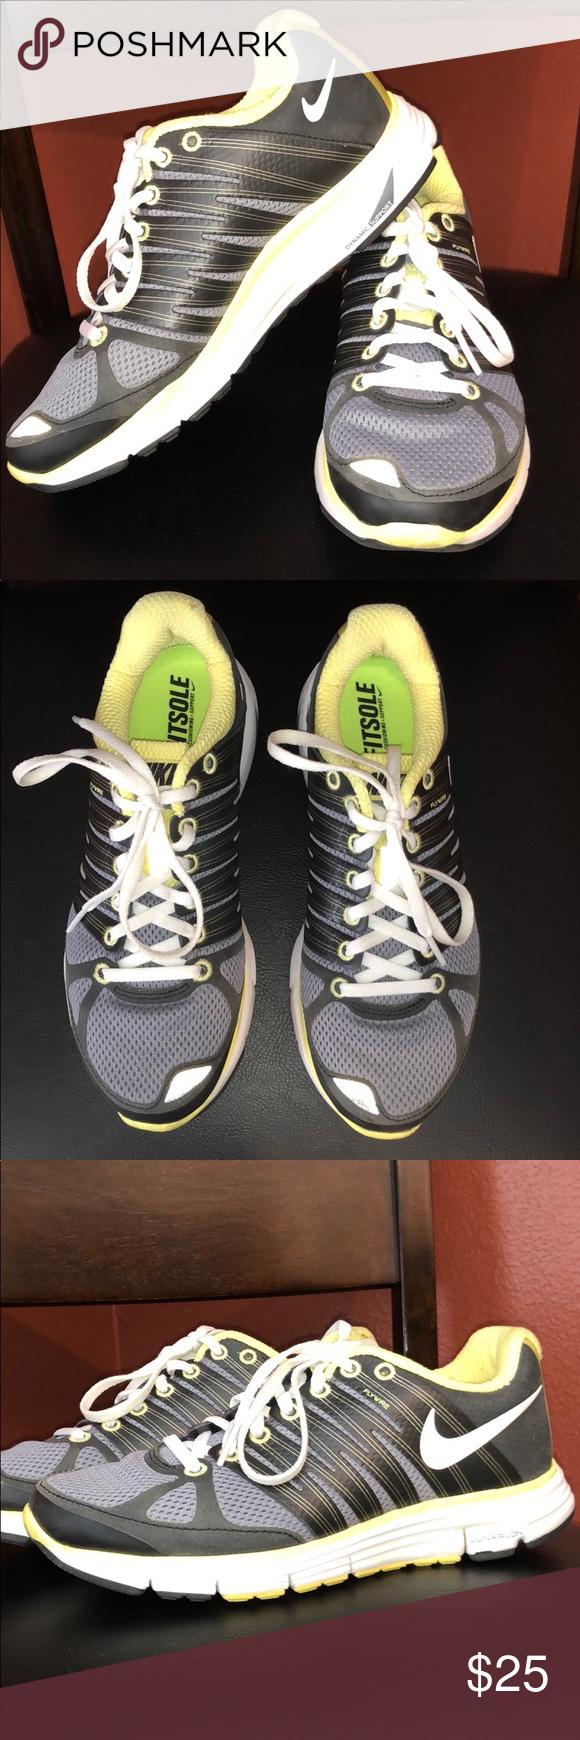 best website 6c938 f44be Spotted while shopping on Poshmark  Women s Nike Lunarlon Lunar Elite 2 -  Gray, Yellow!  poshmark  fashion  shopping  style  Nike  Shoes